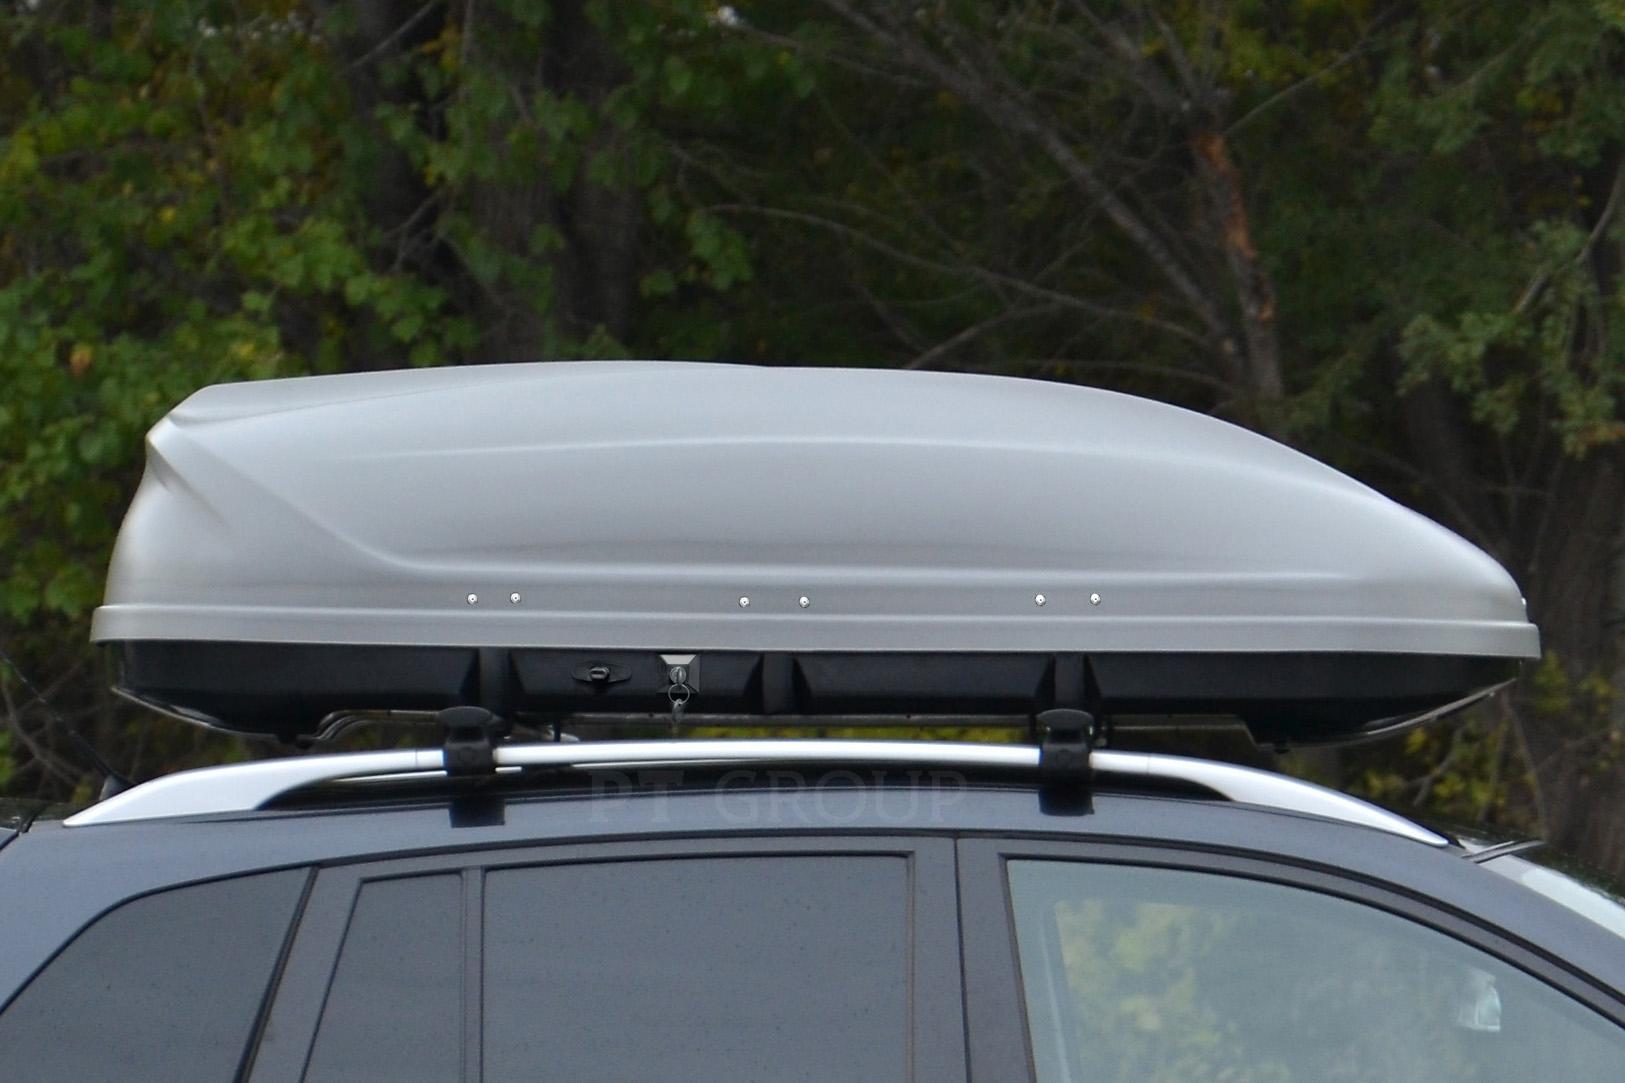 Автомобильный бокс на крышу Turino 1 Серый матовый DUO (Арт.2502)